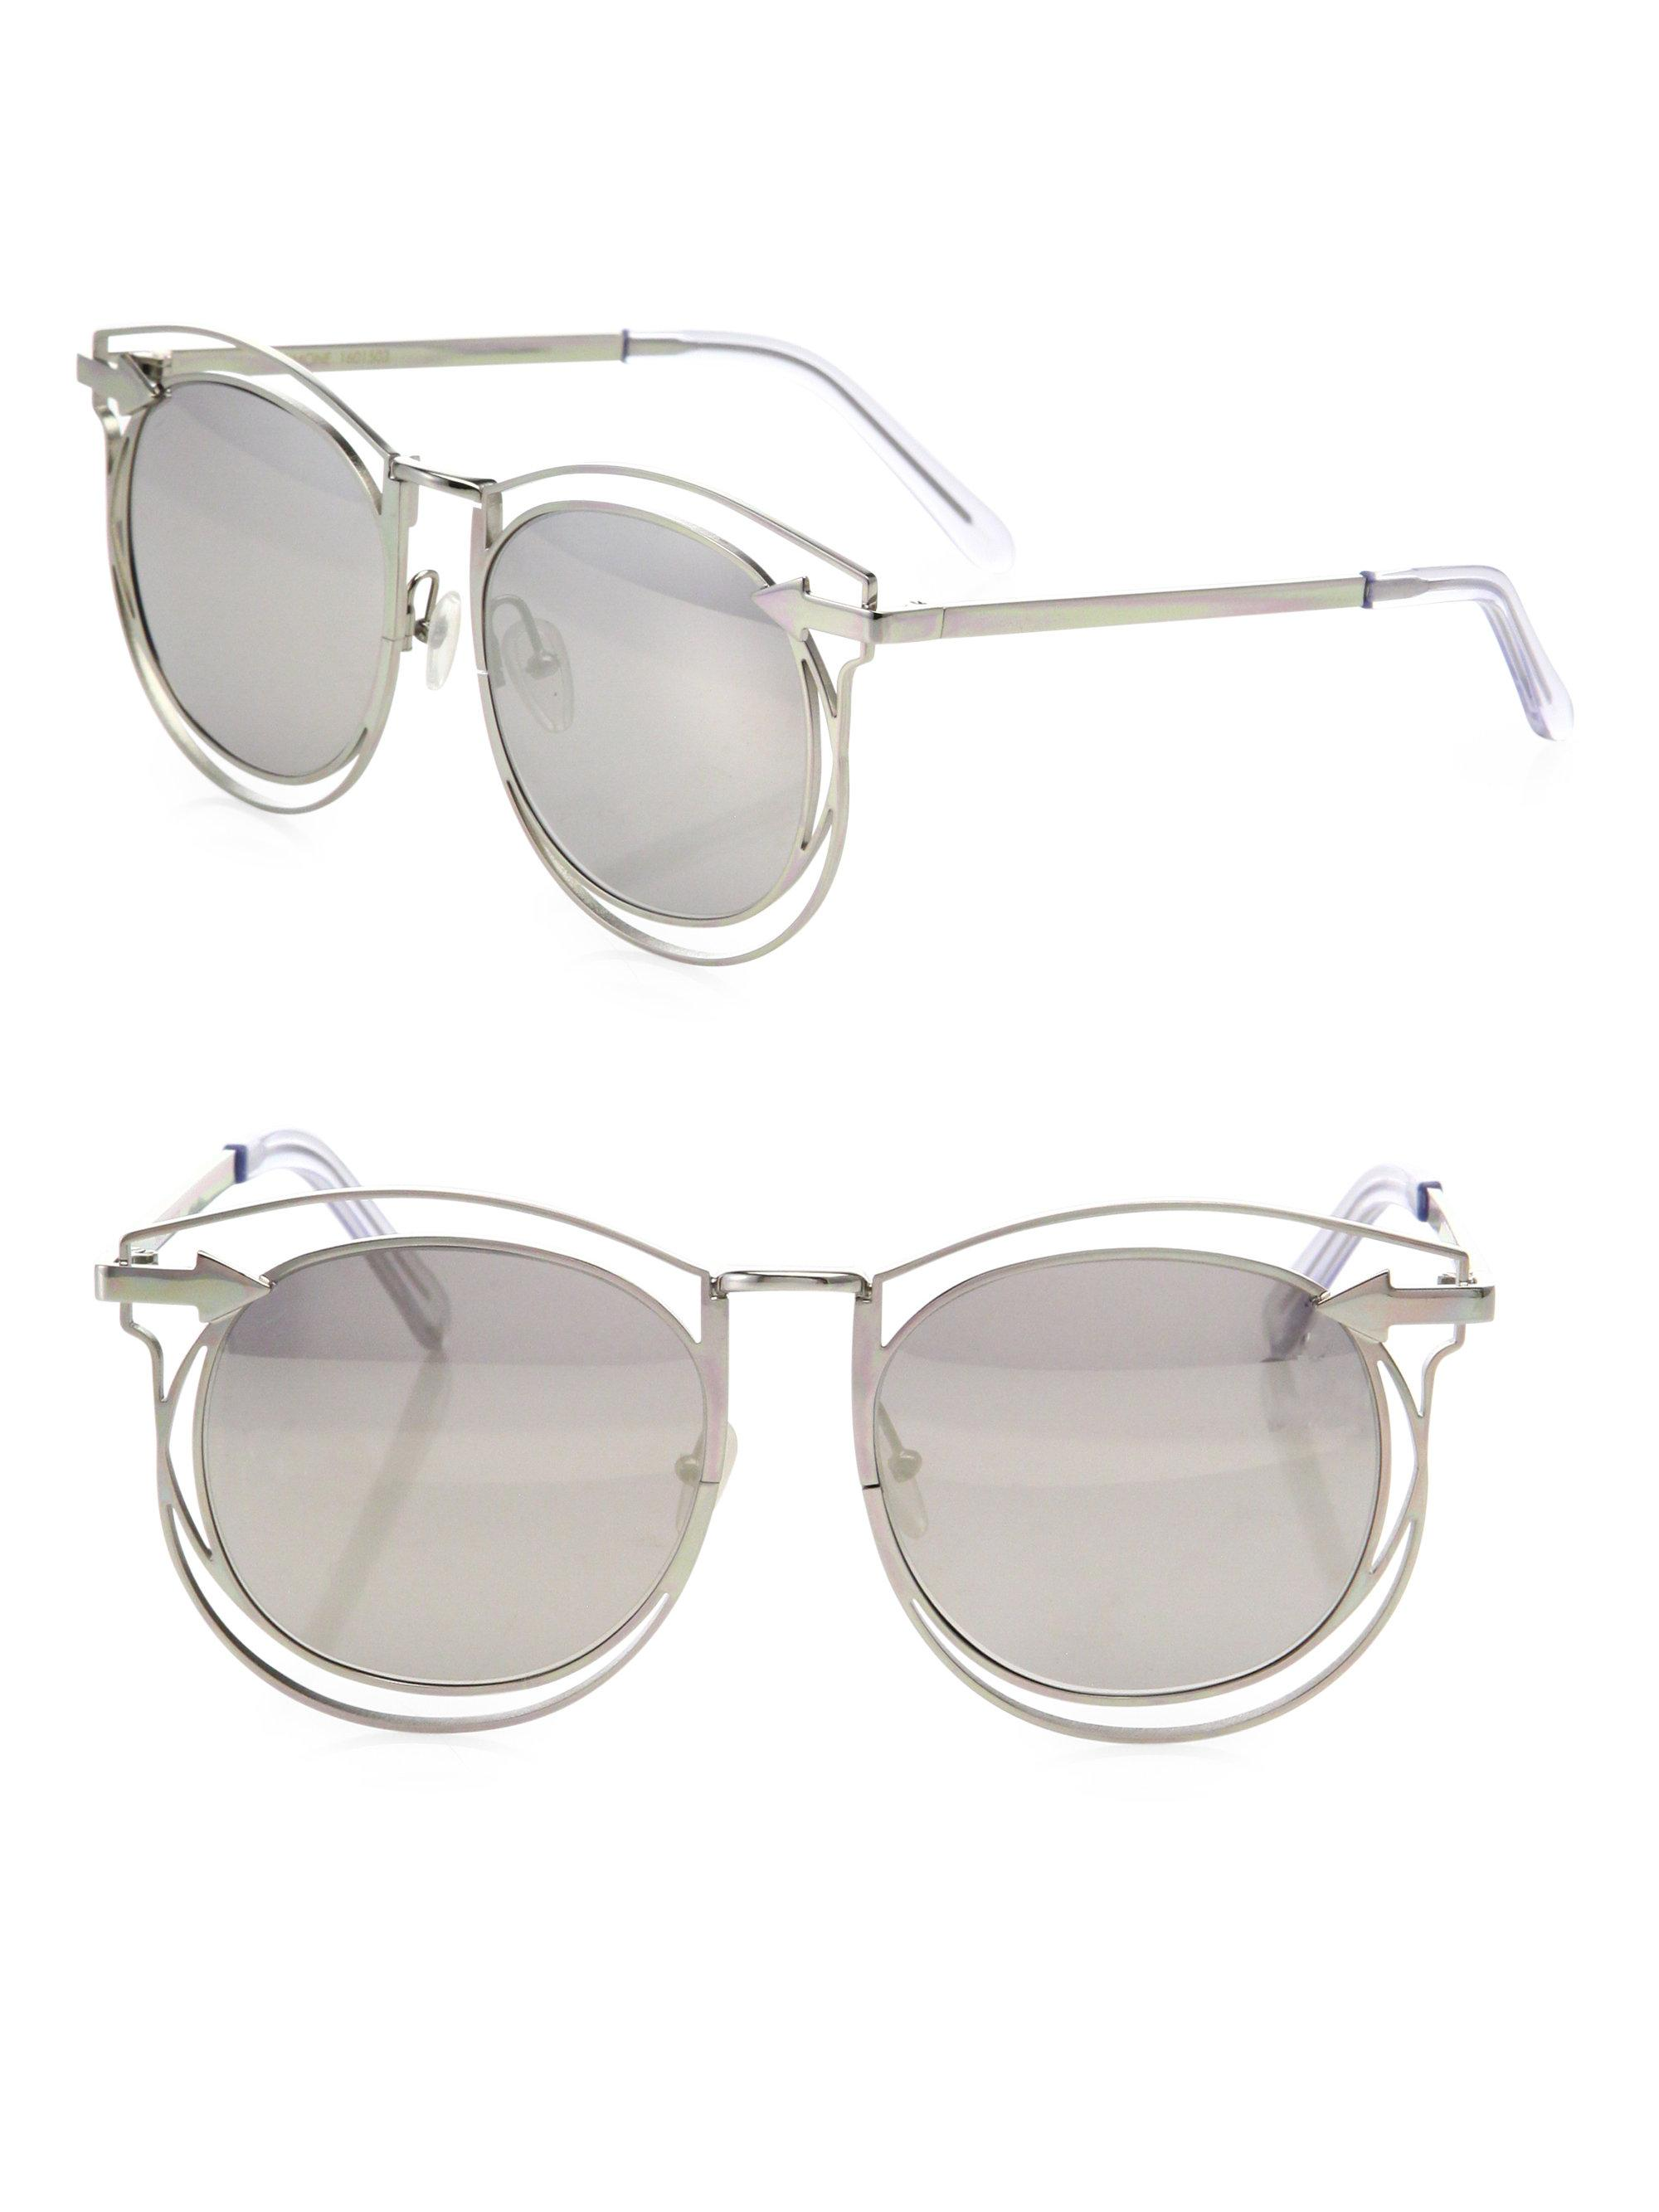 56ea9d6387333 Karen Walker Simone 54mm Mirrored Cutout Round Sunglasses in ...